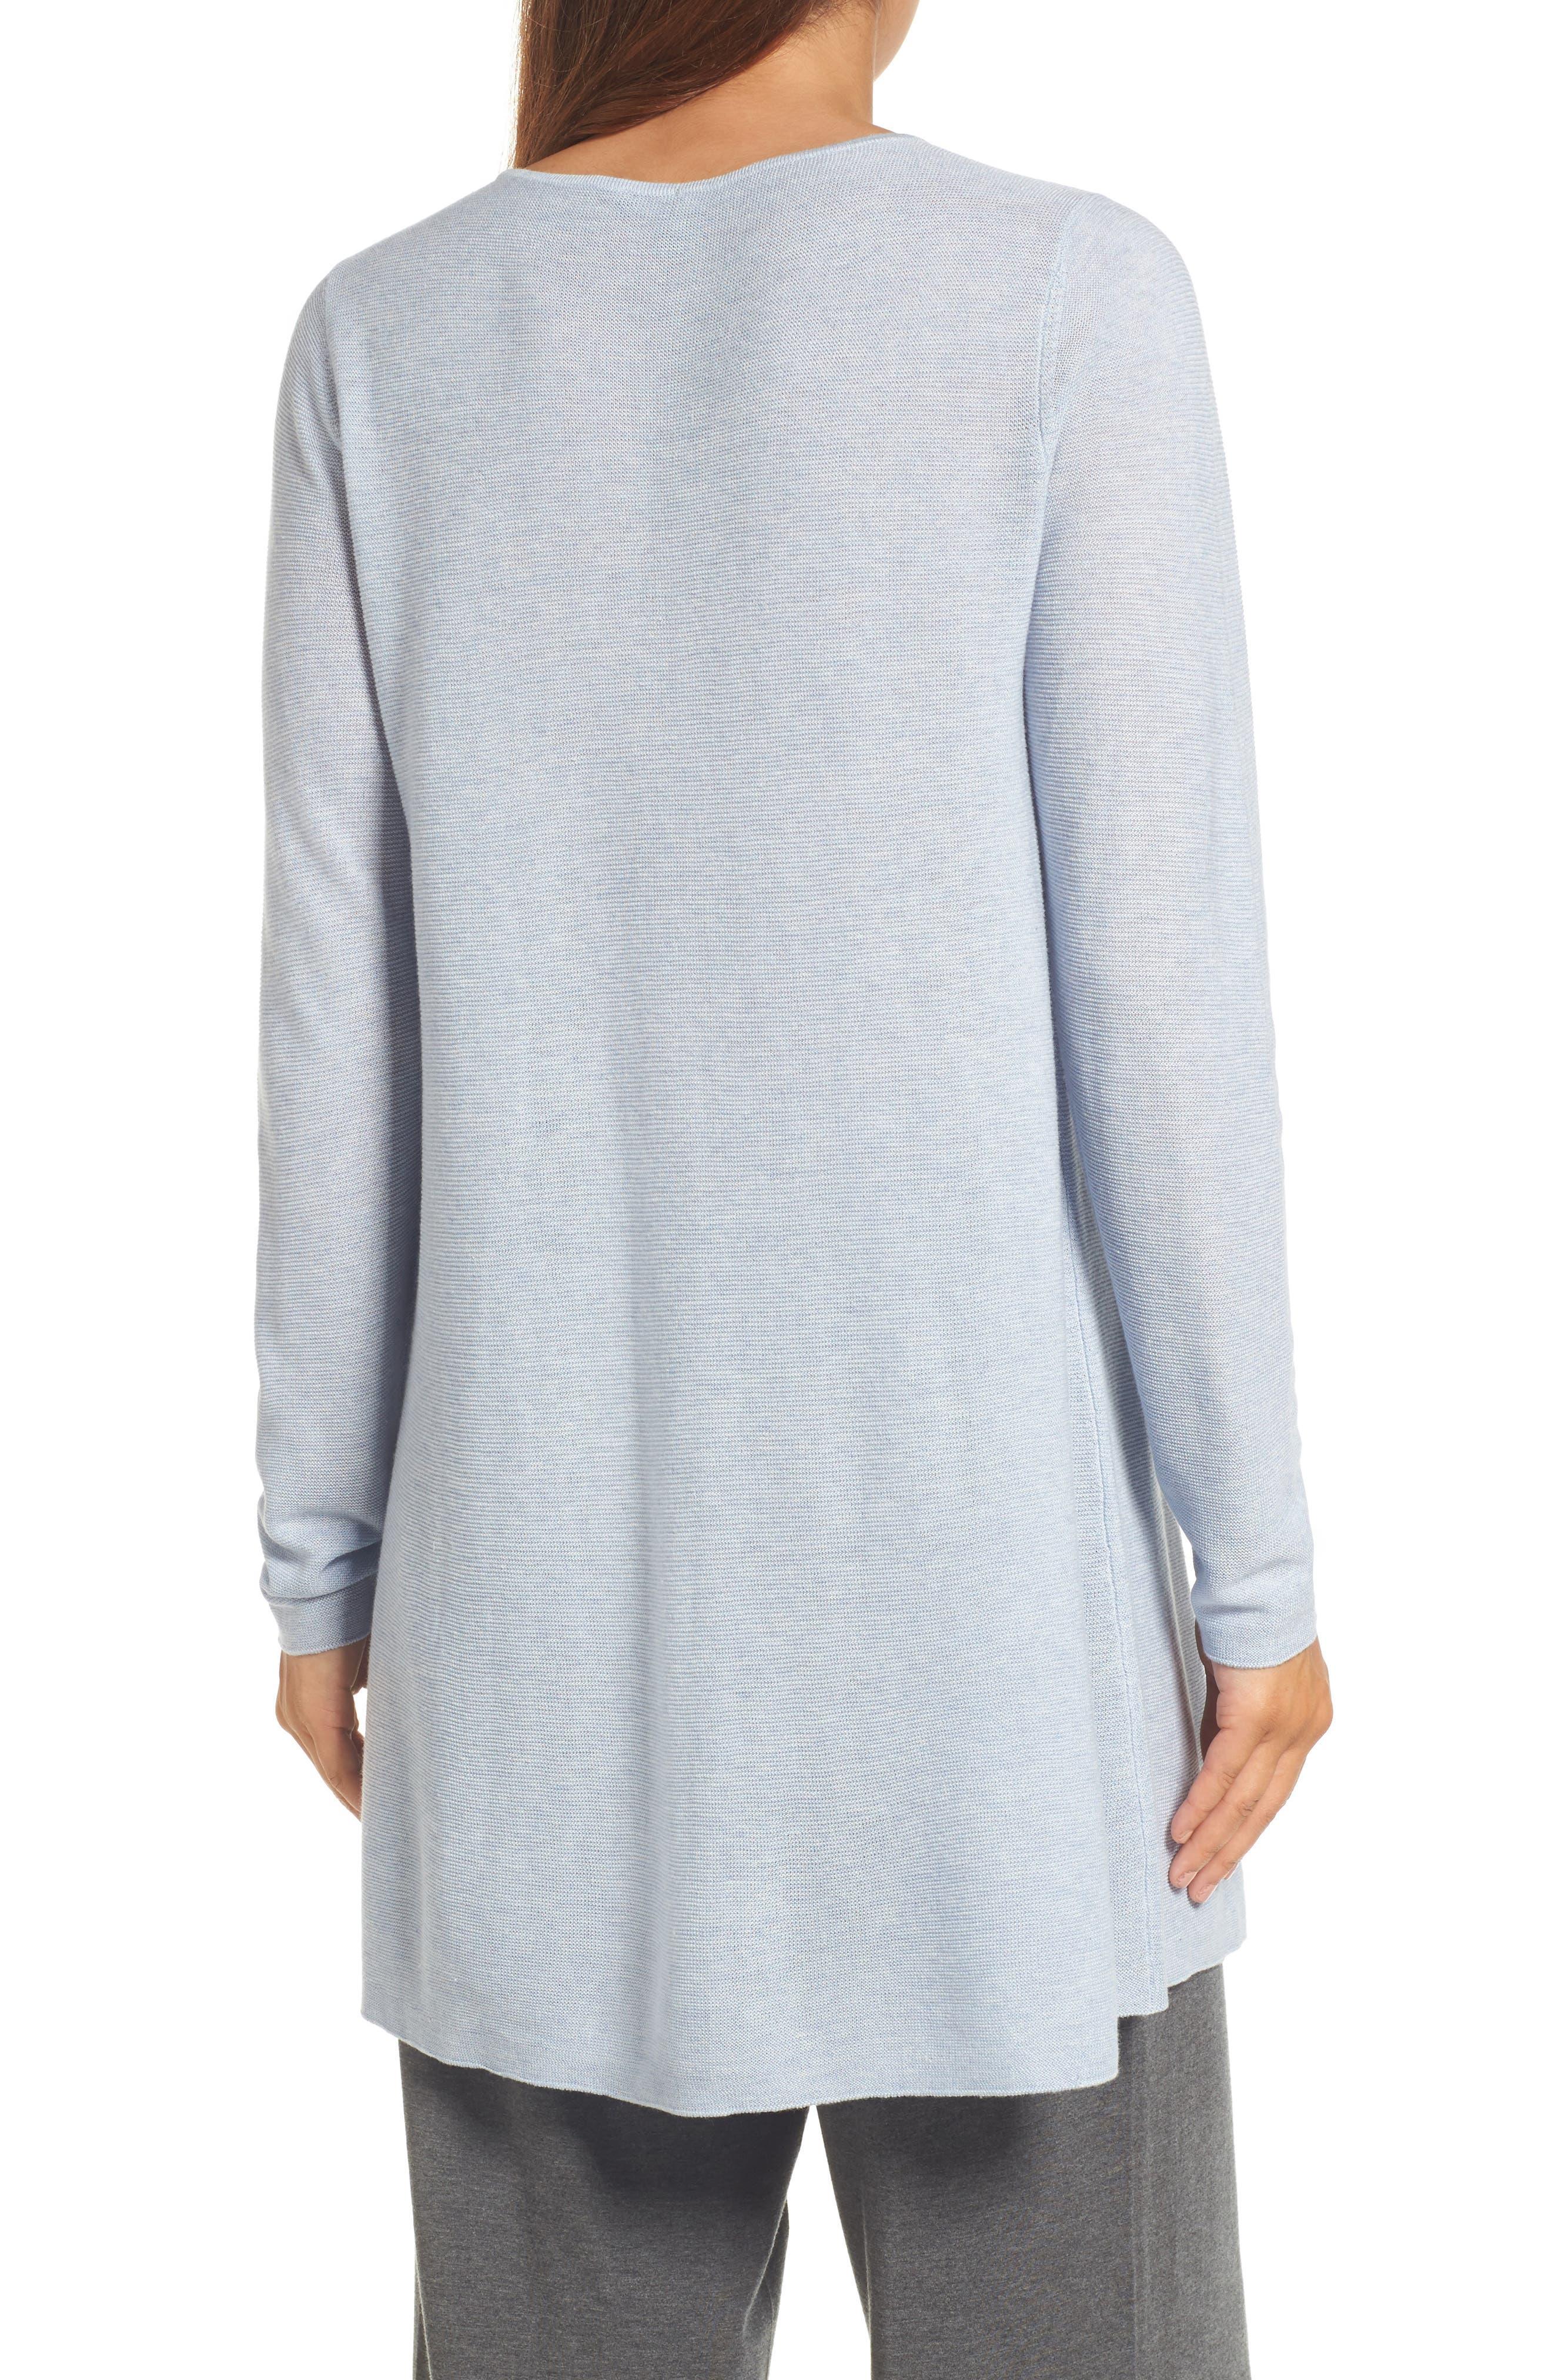 Jewel Neck Tunic Sweater,                             Alternate thumbnail 2, color,                             Delphine